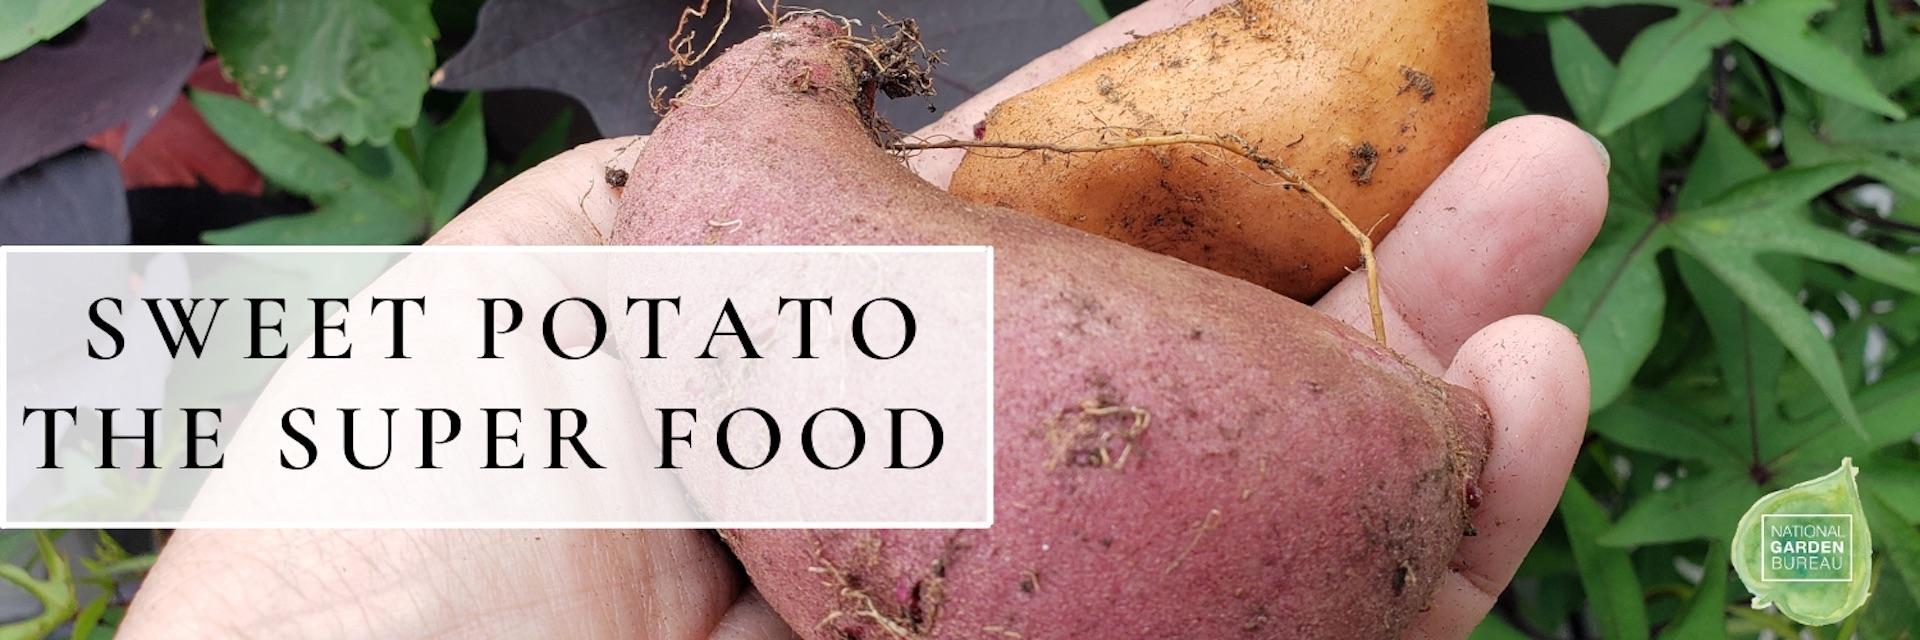 Sweet potato tuber